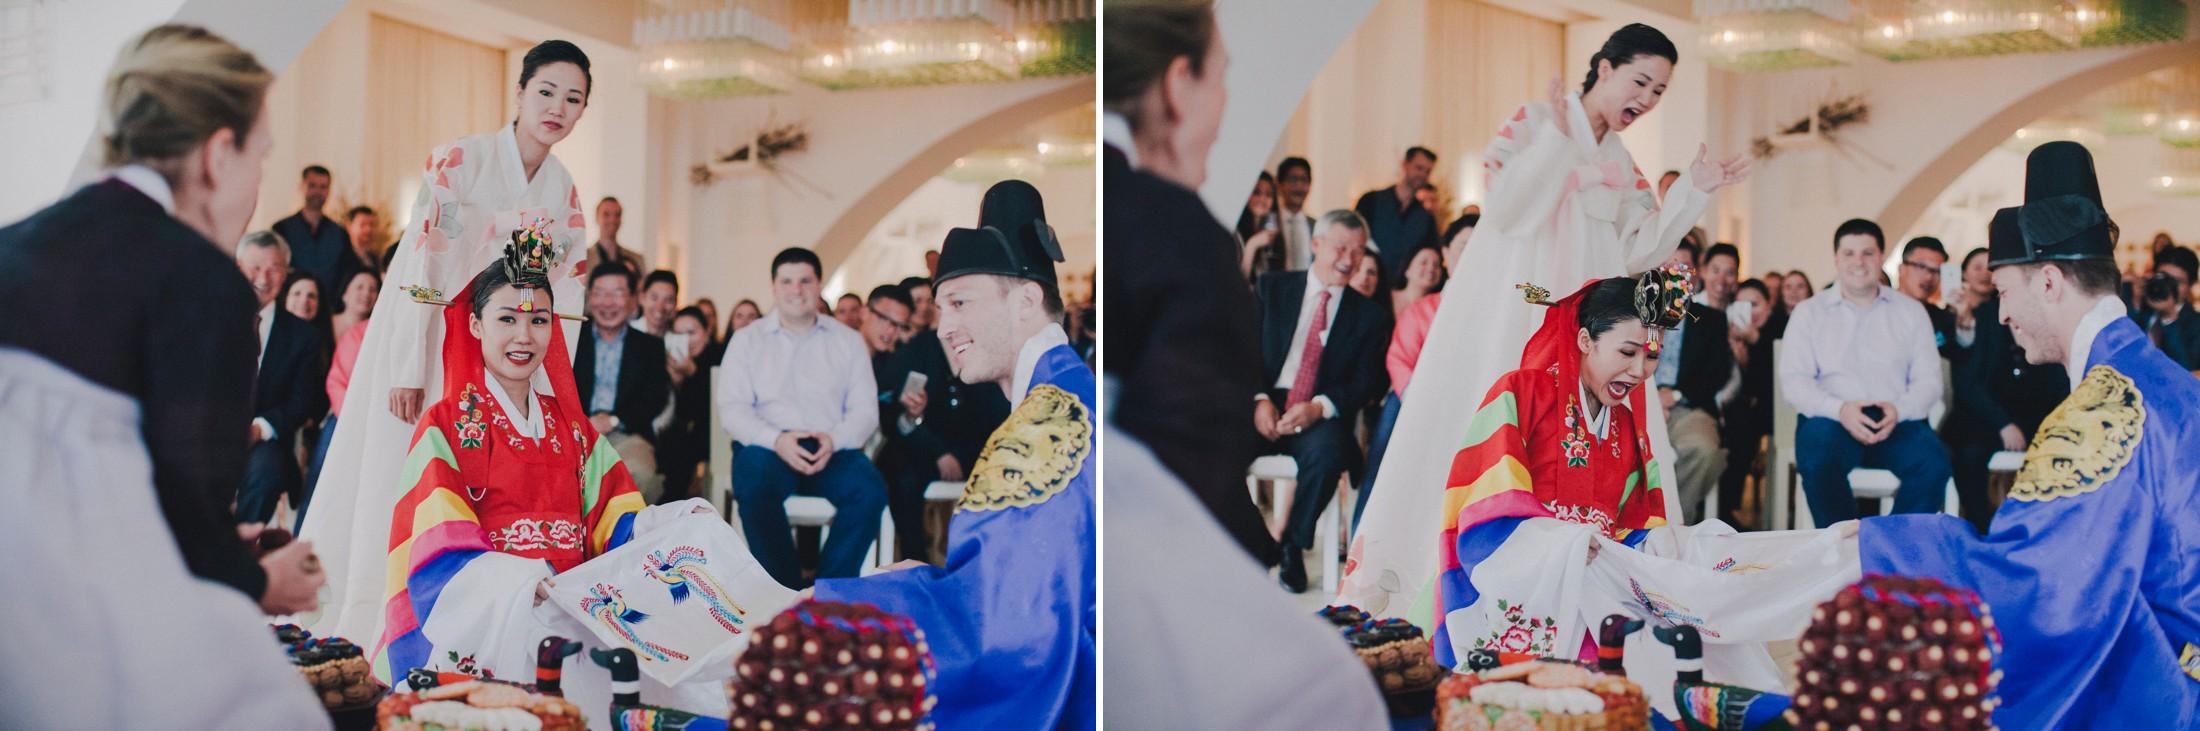 bride and groom during the traditional Korean wedding ceremony at Borgo Egnazia Apulia